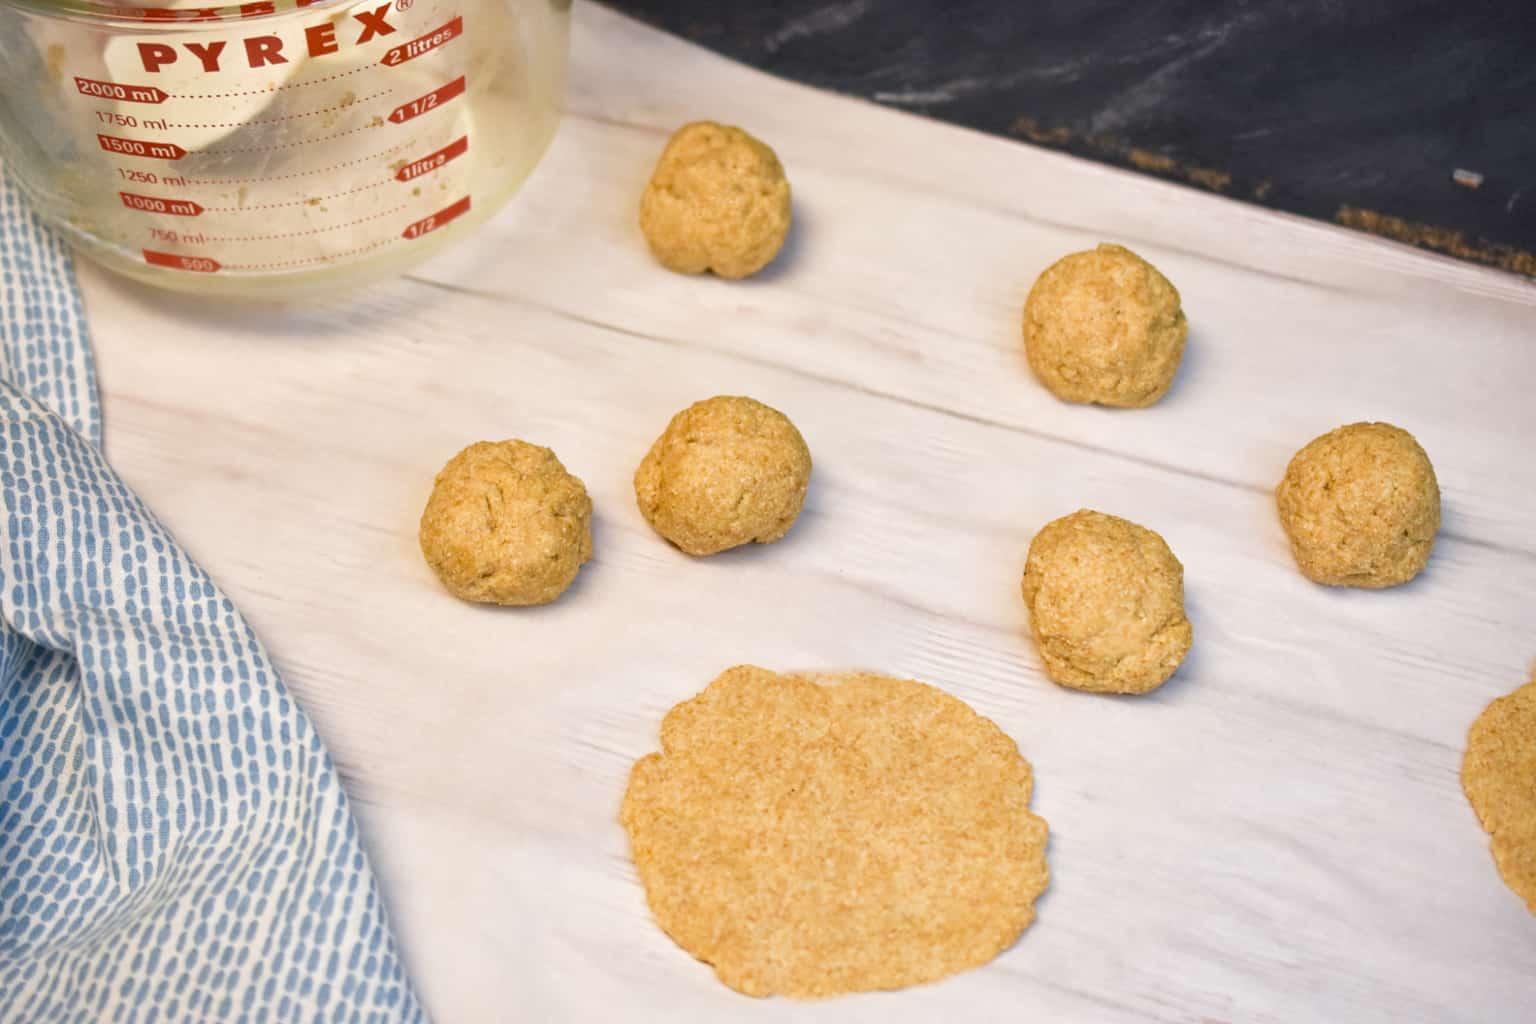 keto tortillas being made